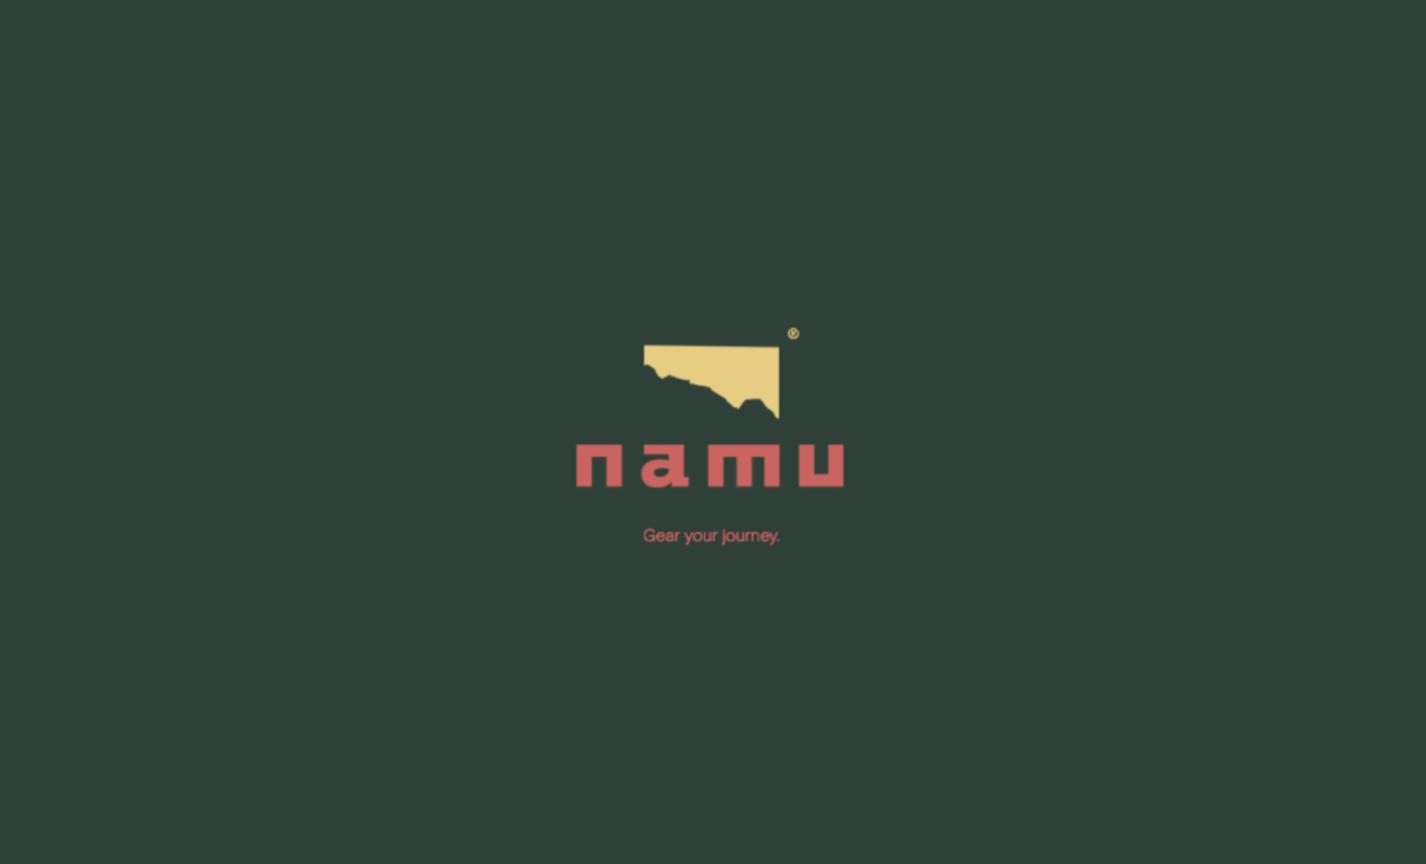 Plains_Of_Yonder_NAMU3.png